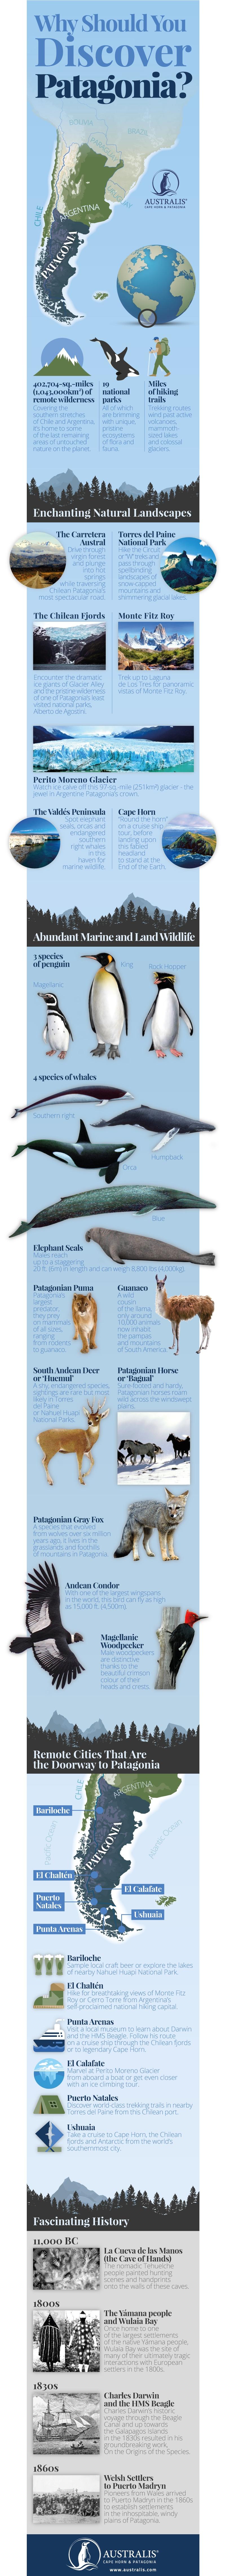 australis-patagonia-parte-1